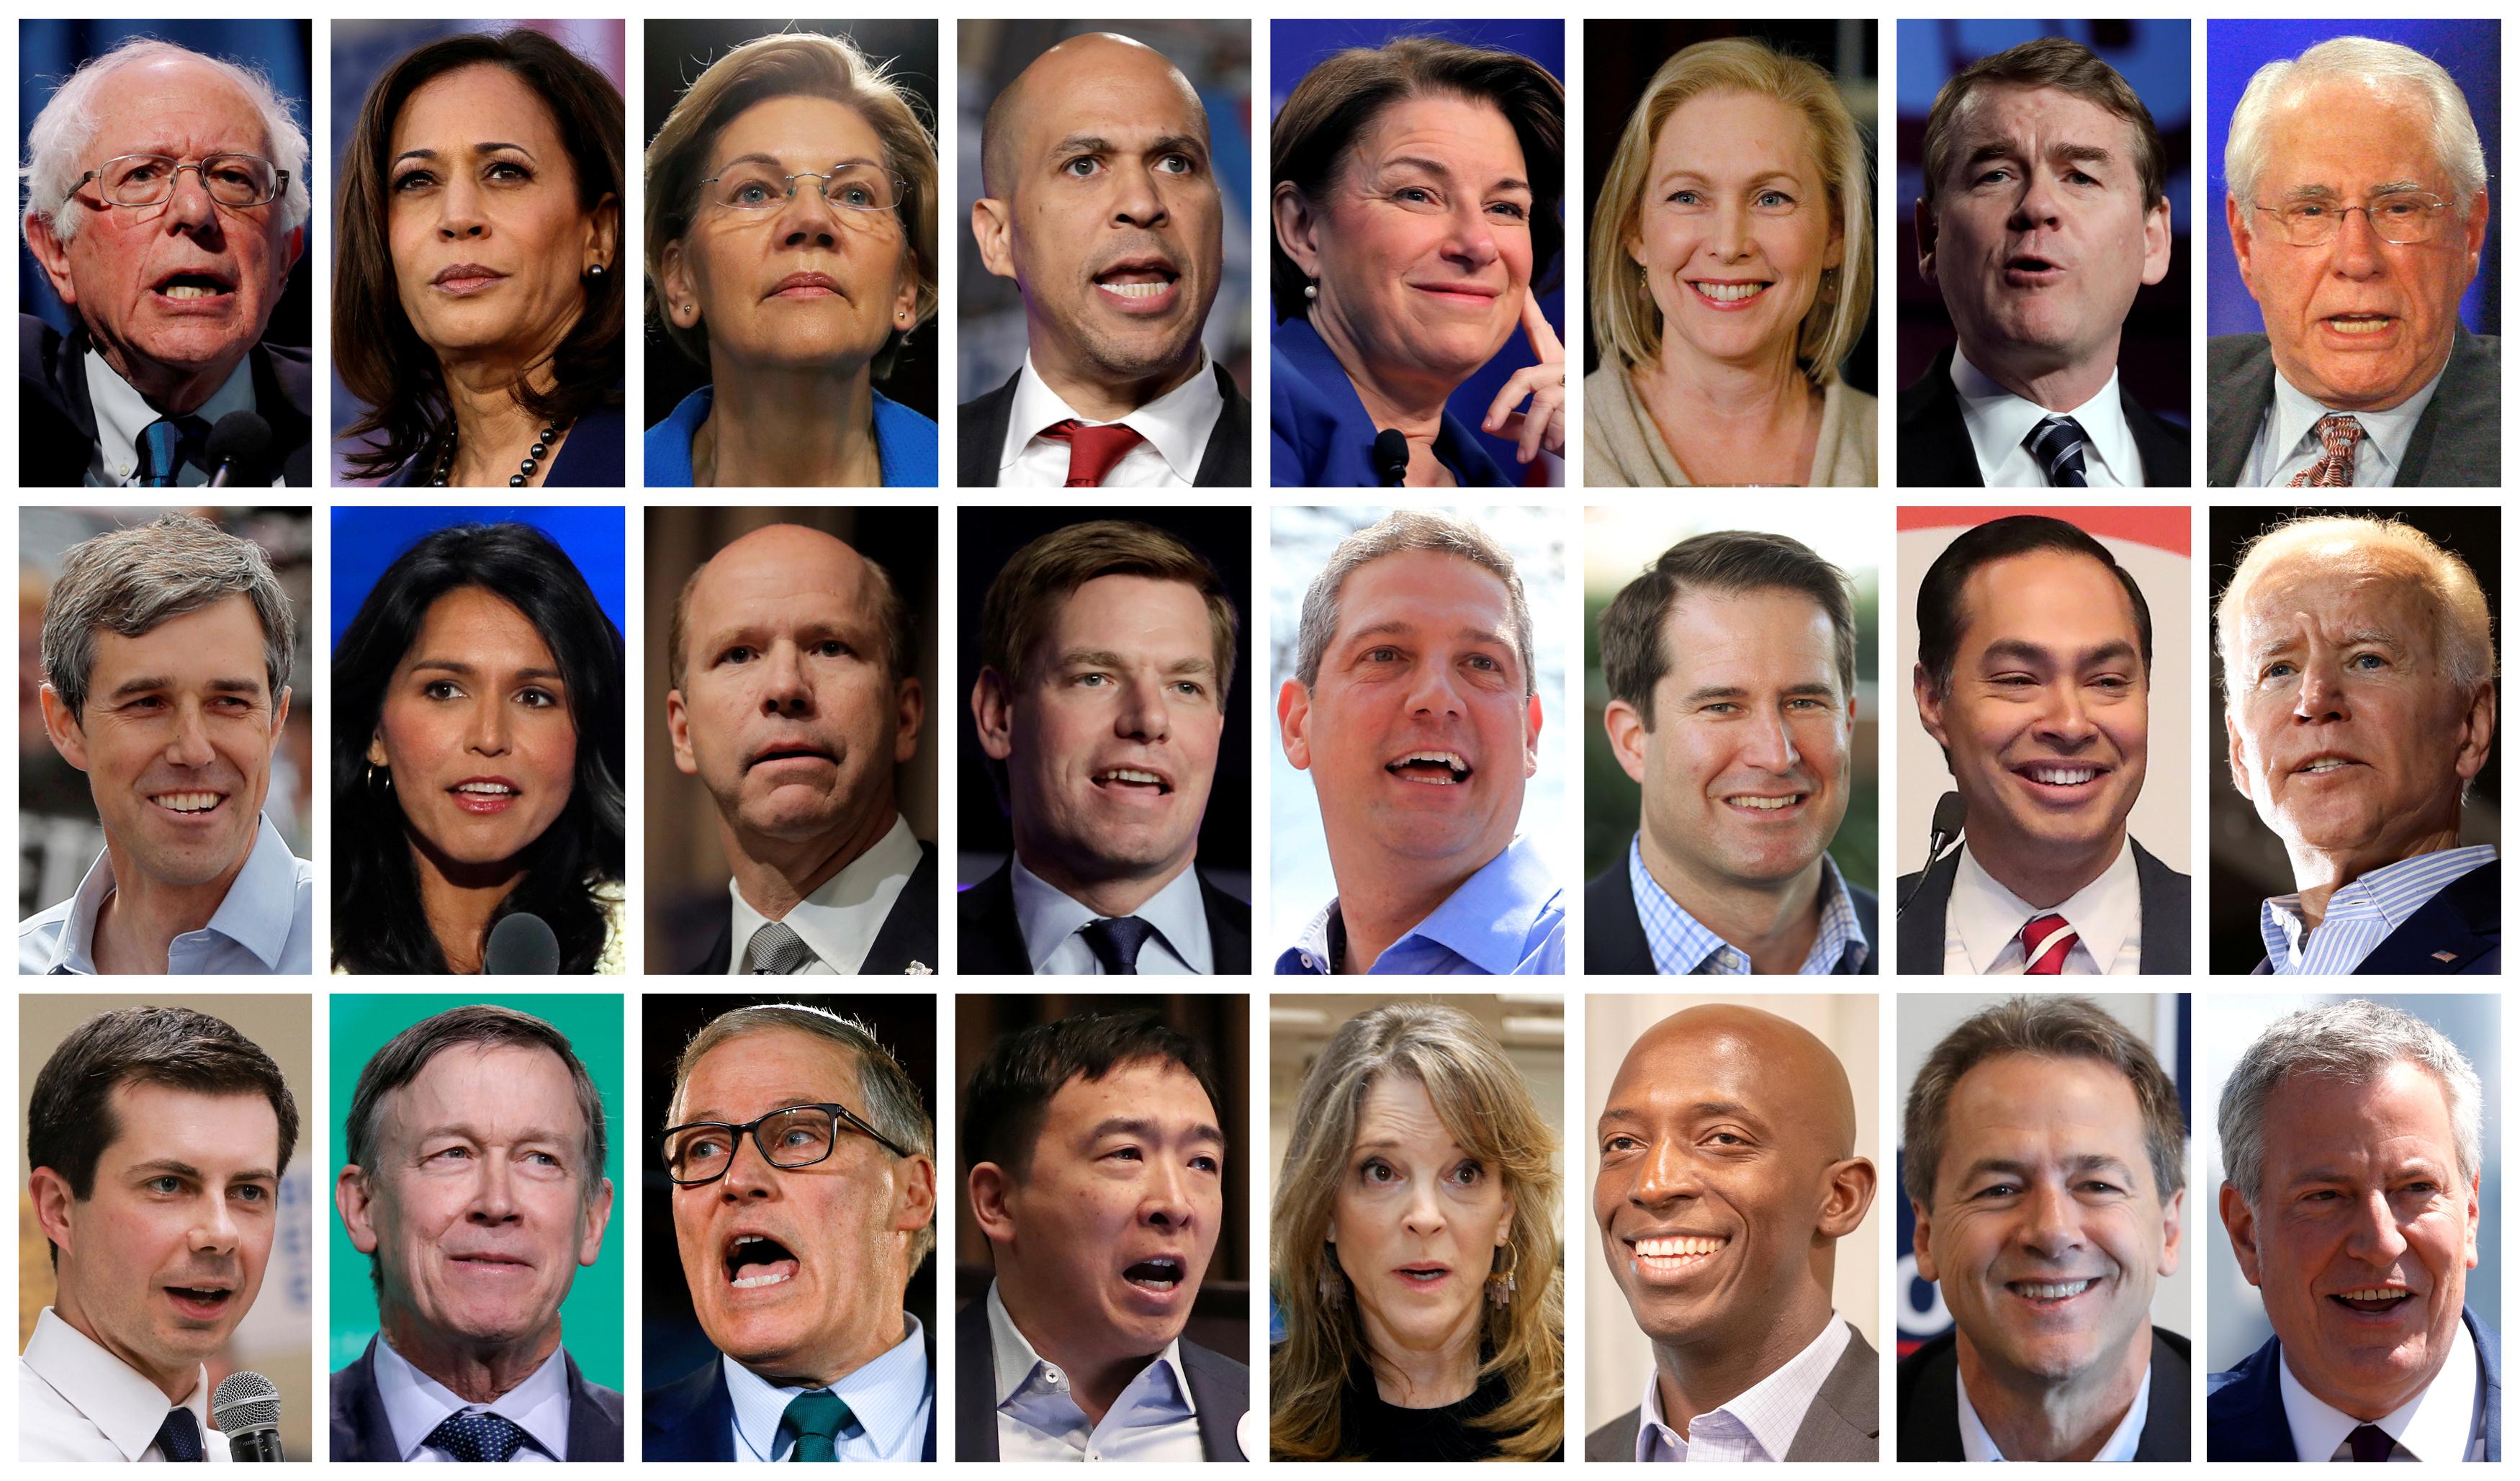 FILE PHOTO: Twenty four 2020 Democratic presidential candidates are seen in a combination from file photos (L-R top row): U.S. Senators Bernie Sanders, Kamala Harris, Elizabeth Warren, Cory Booker, Amy Klobuchar, Kirsten Gillibrand, Michael Bennet and former U.S. Senator Mike Gravel. (L-R middle row): Former Texas congressman Beto O'Rourke, U.S. Representatives Tulsi Gabbard, John Delaney, Eric Swalwell, Tim Ryan, Seth Moulton, former HUD Secretary Julian Castro and former U.S. Vice President Joe Biden. (L-R bottom row): Mayor Pete Buttigieg, Former Gov. John Hickenlooper, Gov. Jay Inslee, Andrew Yang, Marianne Williamson, Mayor Wayne Messam, Montana Gov. Steve Bullock and New York City Mayor Bill de Blasio.   REUTERS/Files